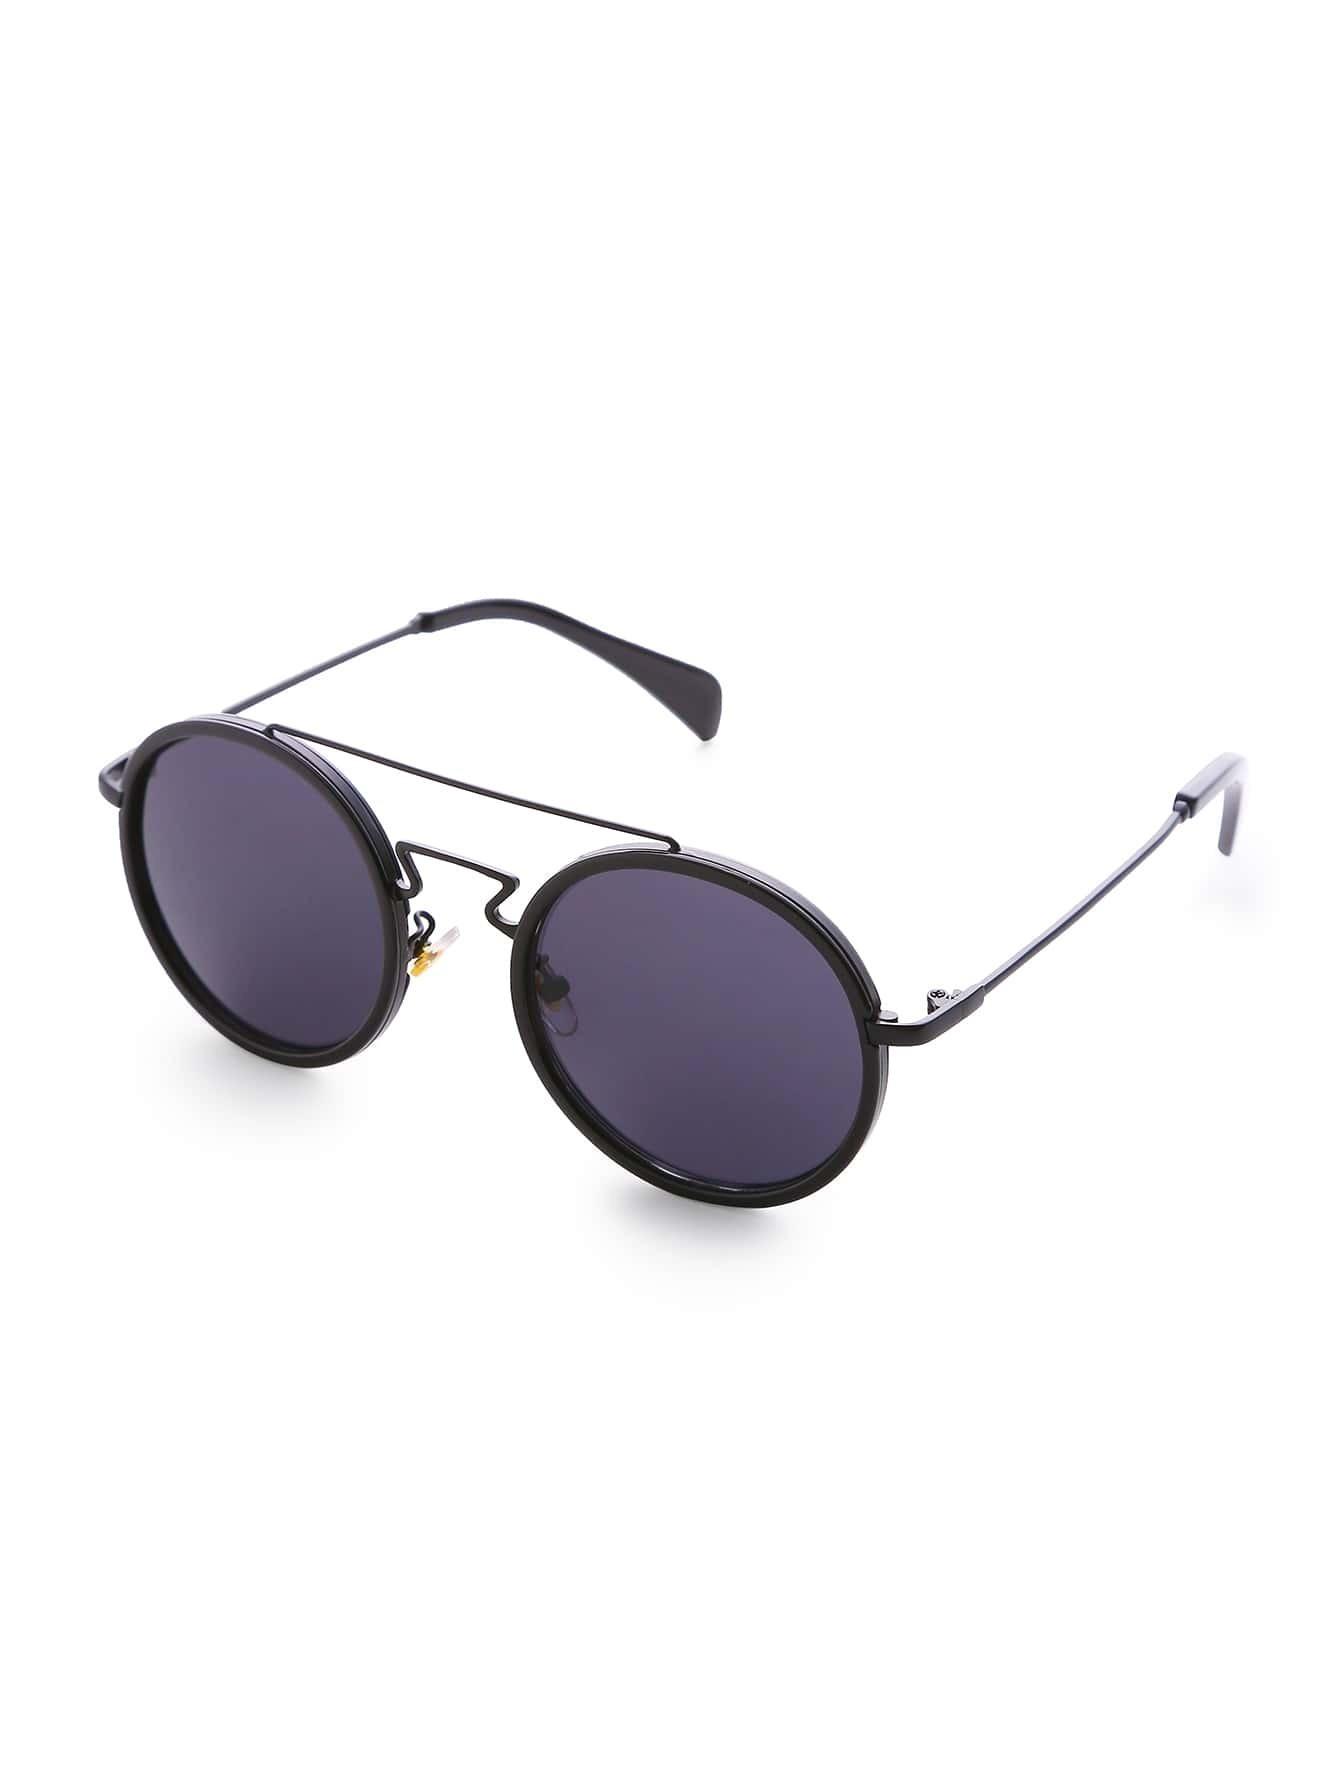 black frame double bridge round sunglassesfor women romwe. Black Bedroom Furniture Sets. Home Design Ideas